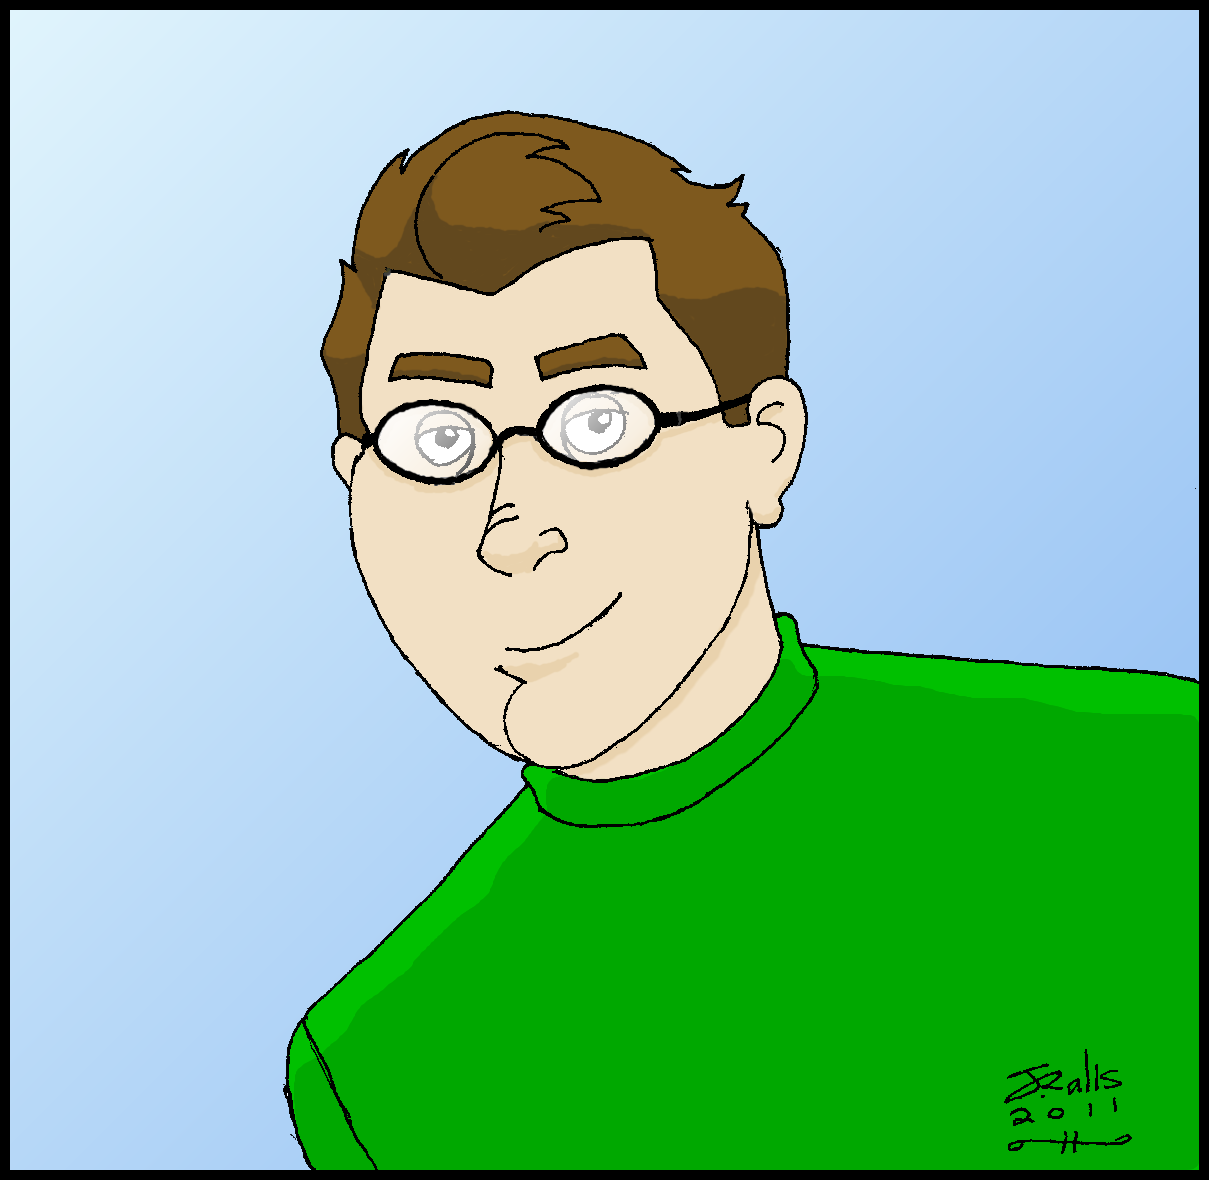 Cartoon Self Portrait 2